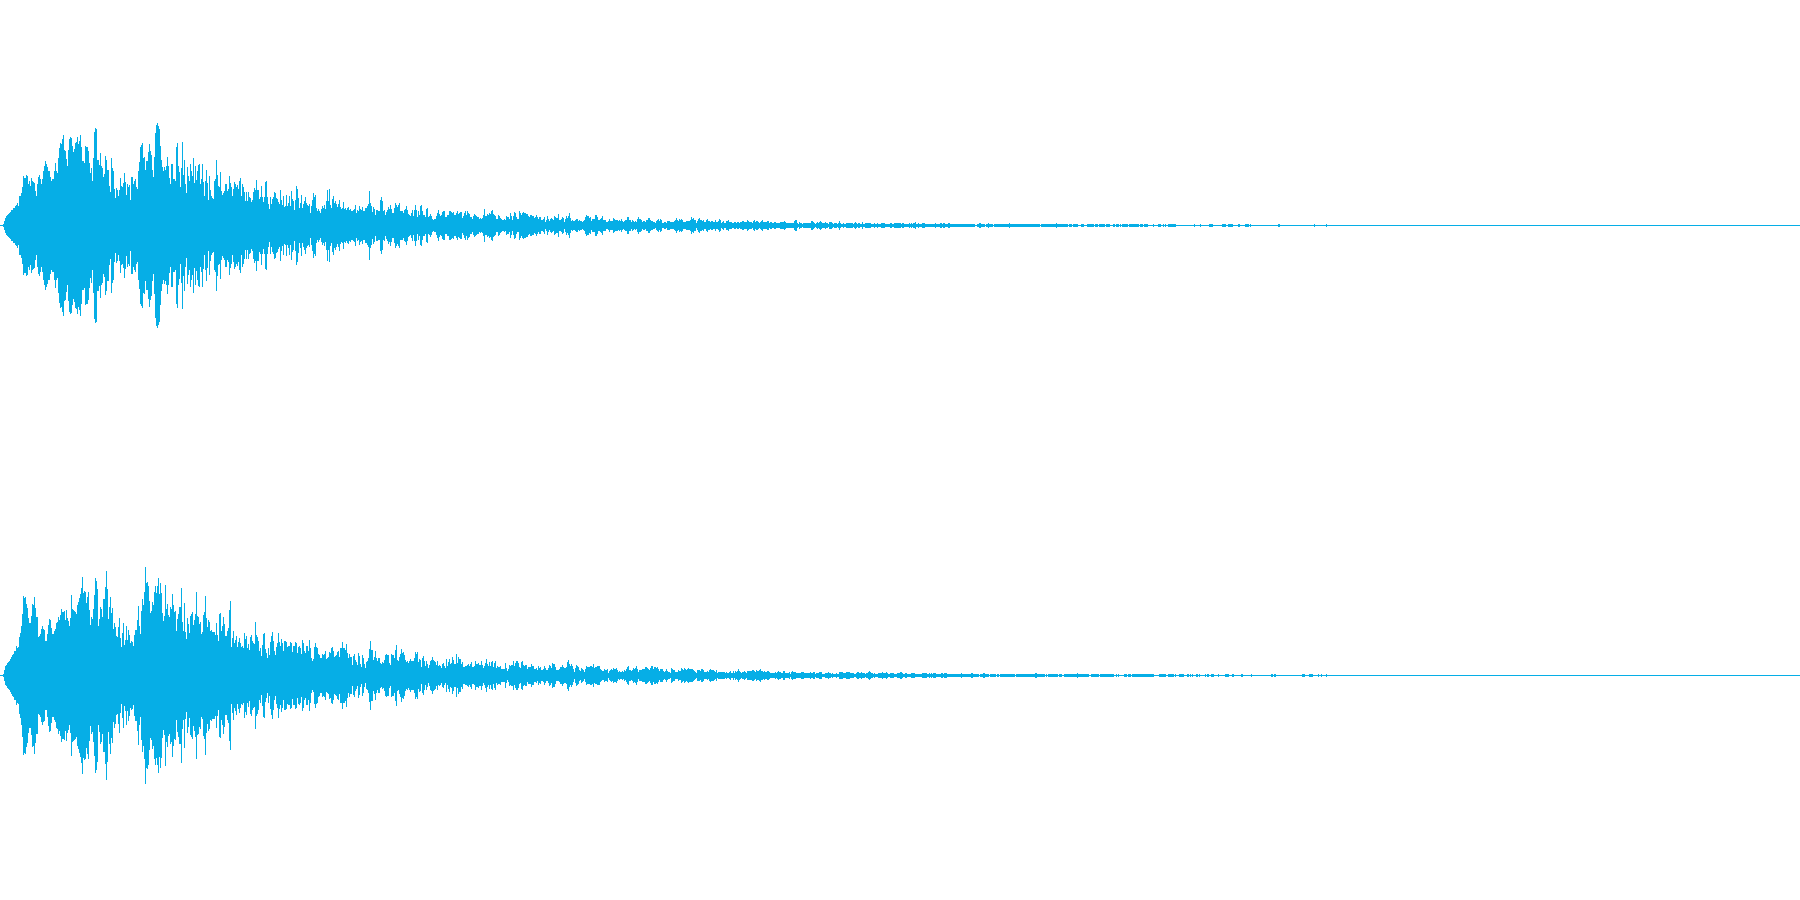 Vox 不気味な鳴き声 ホラーSE 4の再生済みの波形